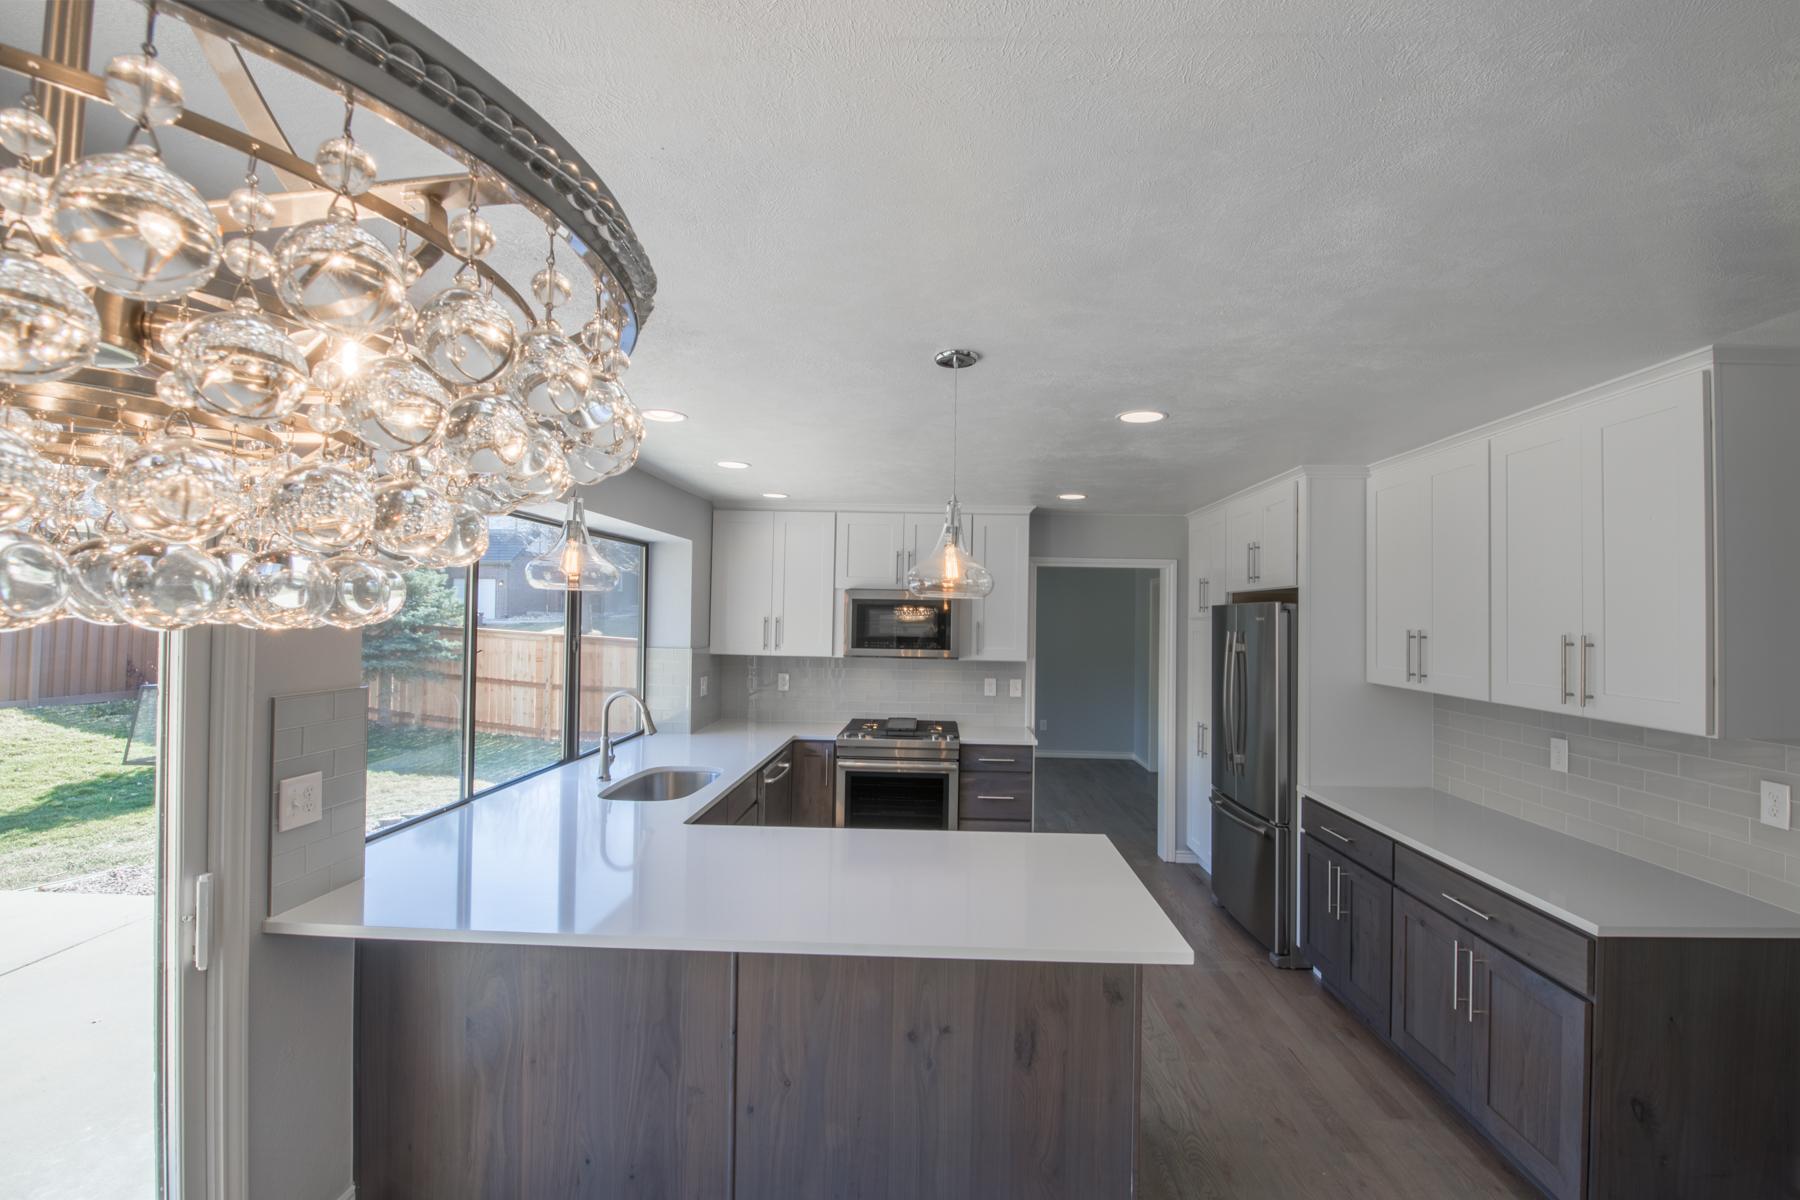 7896 S Fairfax - Kitchen-10.jpg